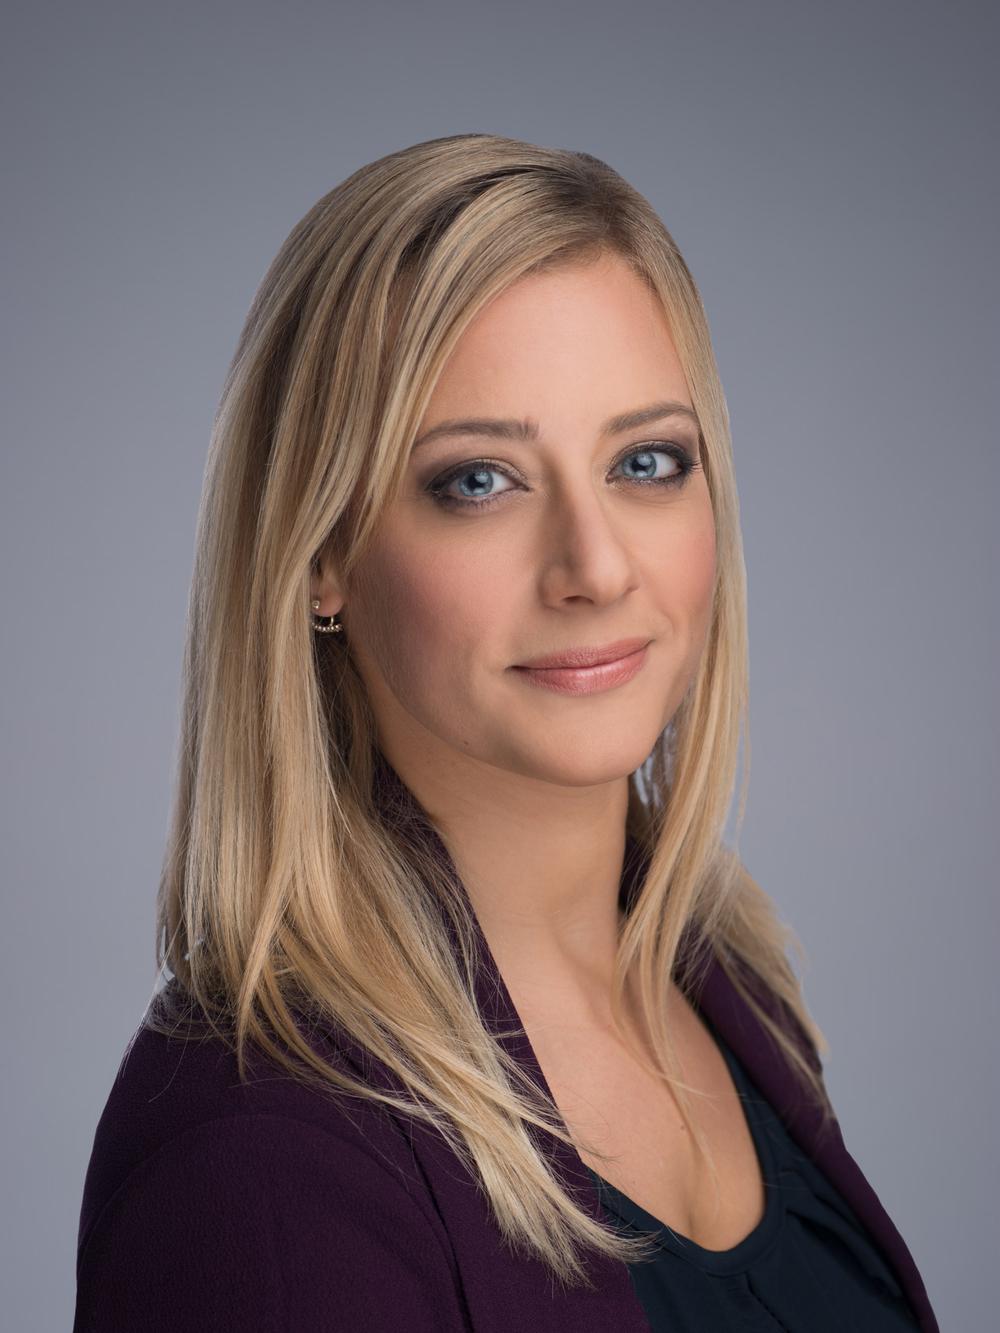 Erin Helland